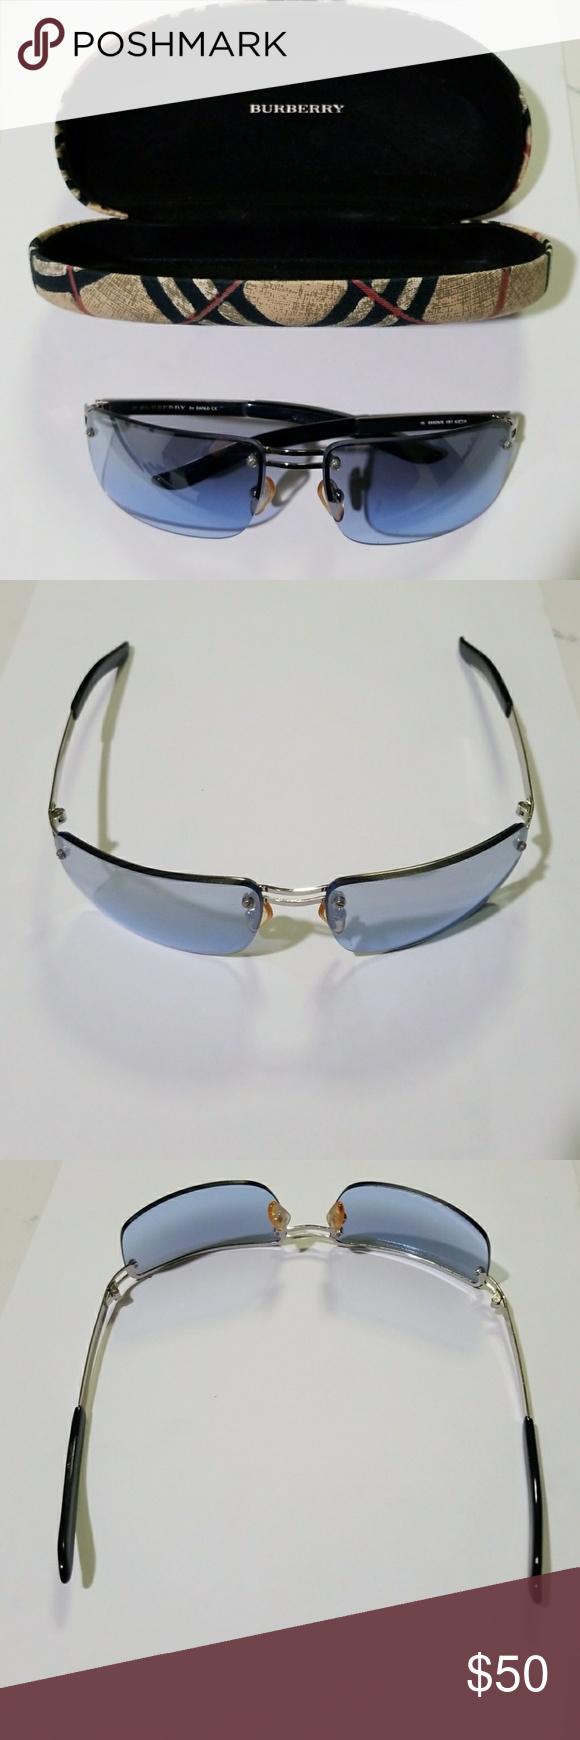 1d90be41286a Authentic Burberry Safilo Sunglasses Authentic Burberry rimless sunglasses.  Blue lens, silver frames. Slight wear on the lens.